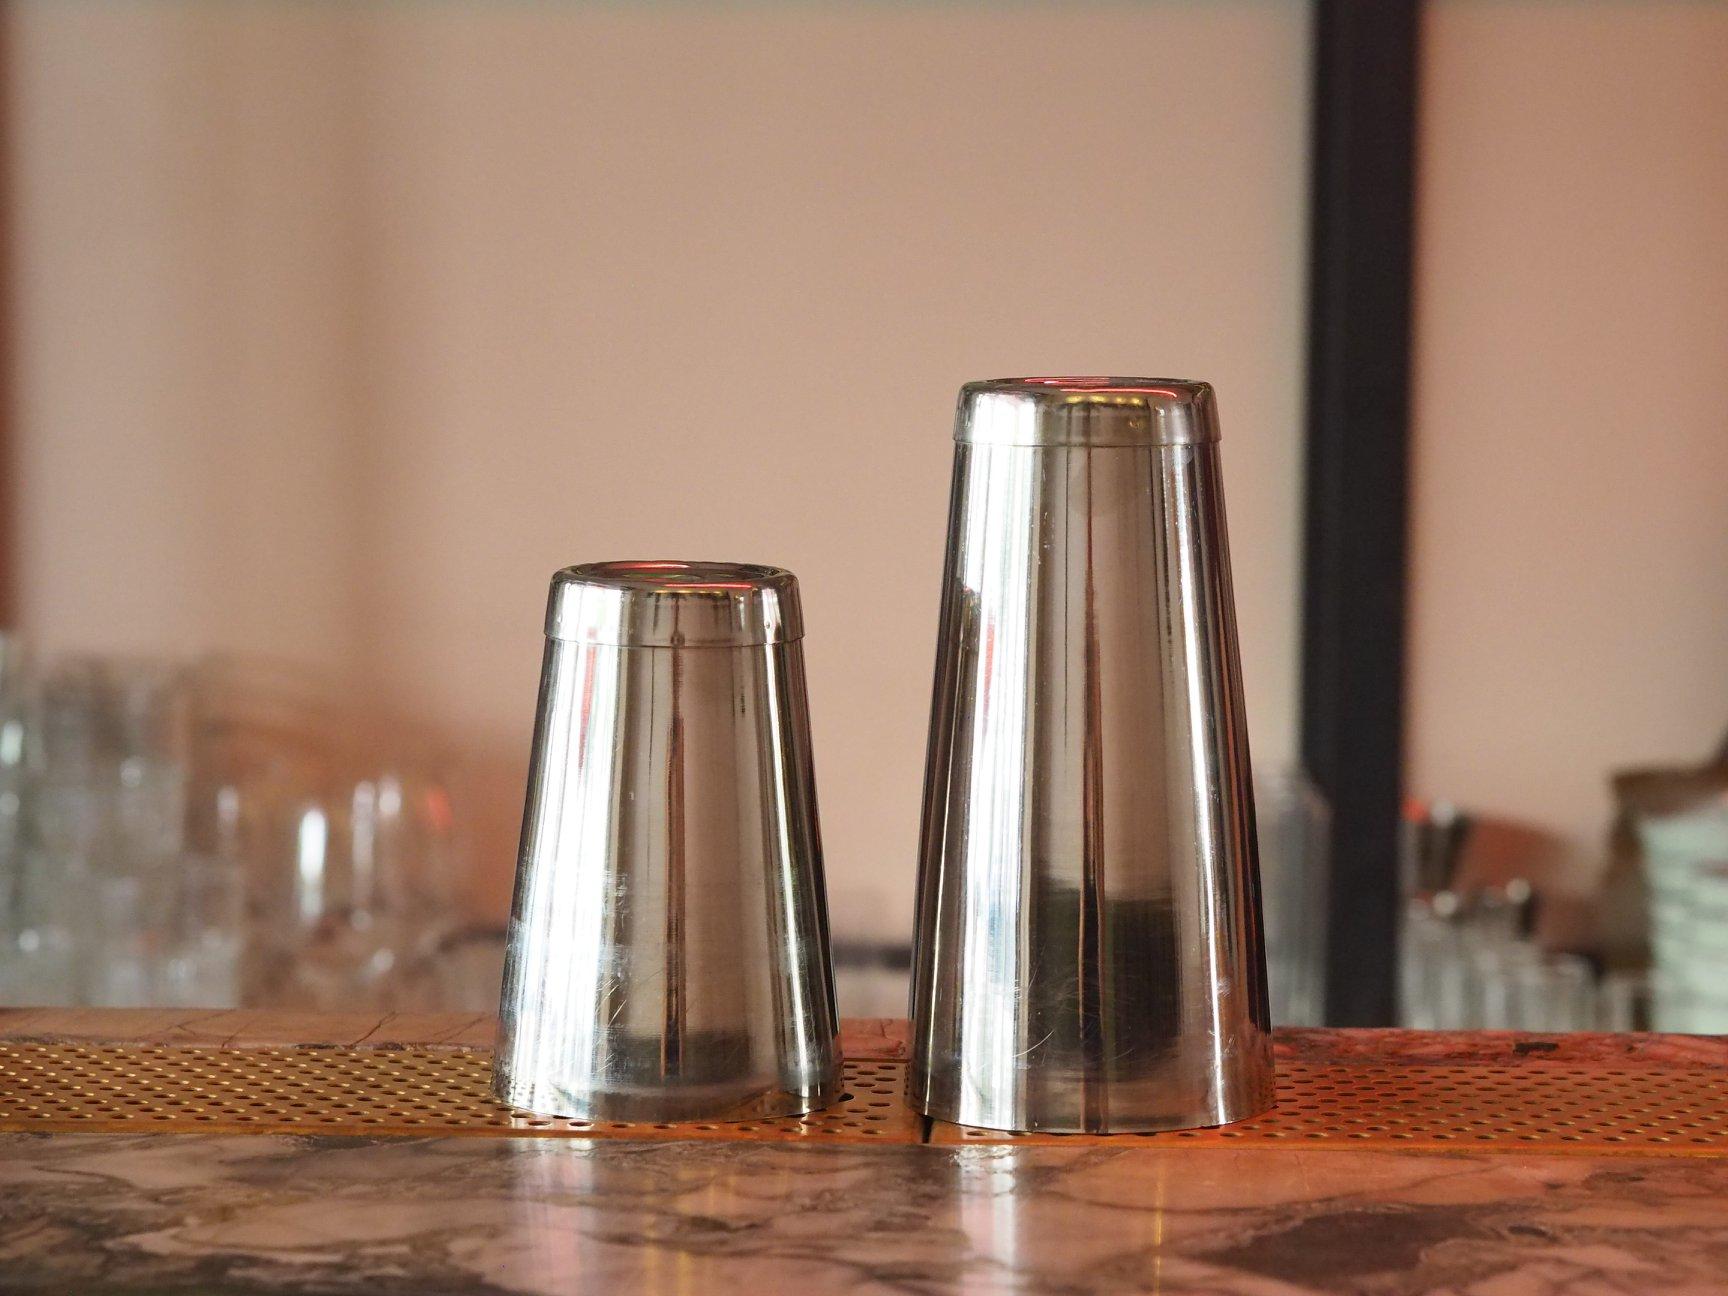 Shaker Boston - Barmen with attitude